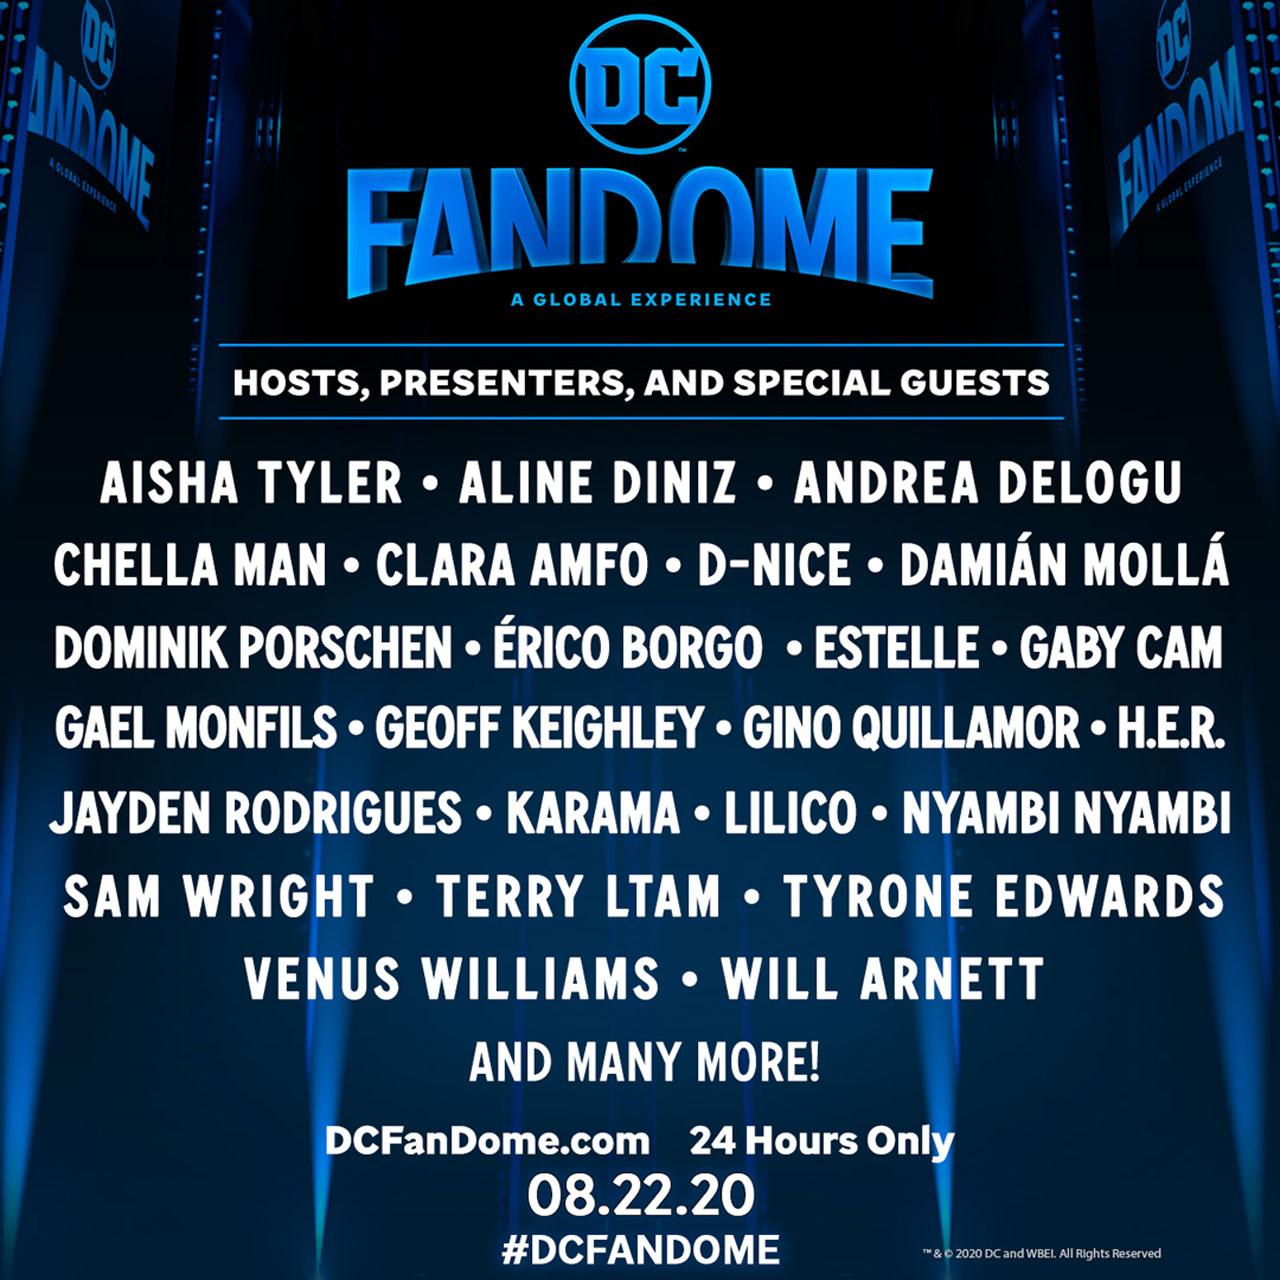 DC_FanDome_Lineup_Hosts_Presenters_SpecialGuests.jpg